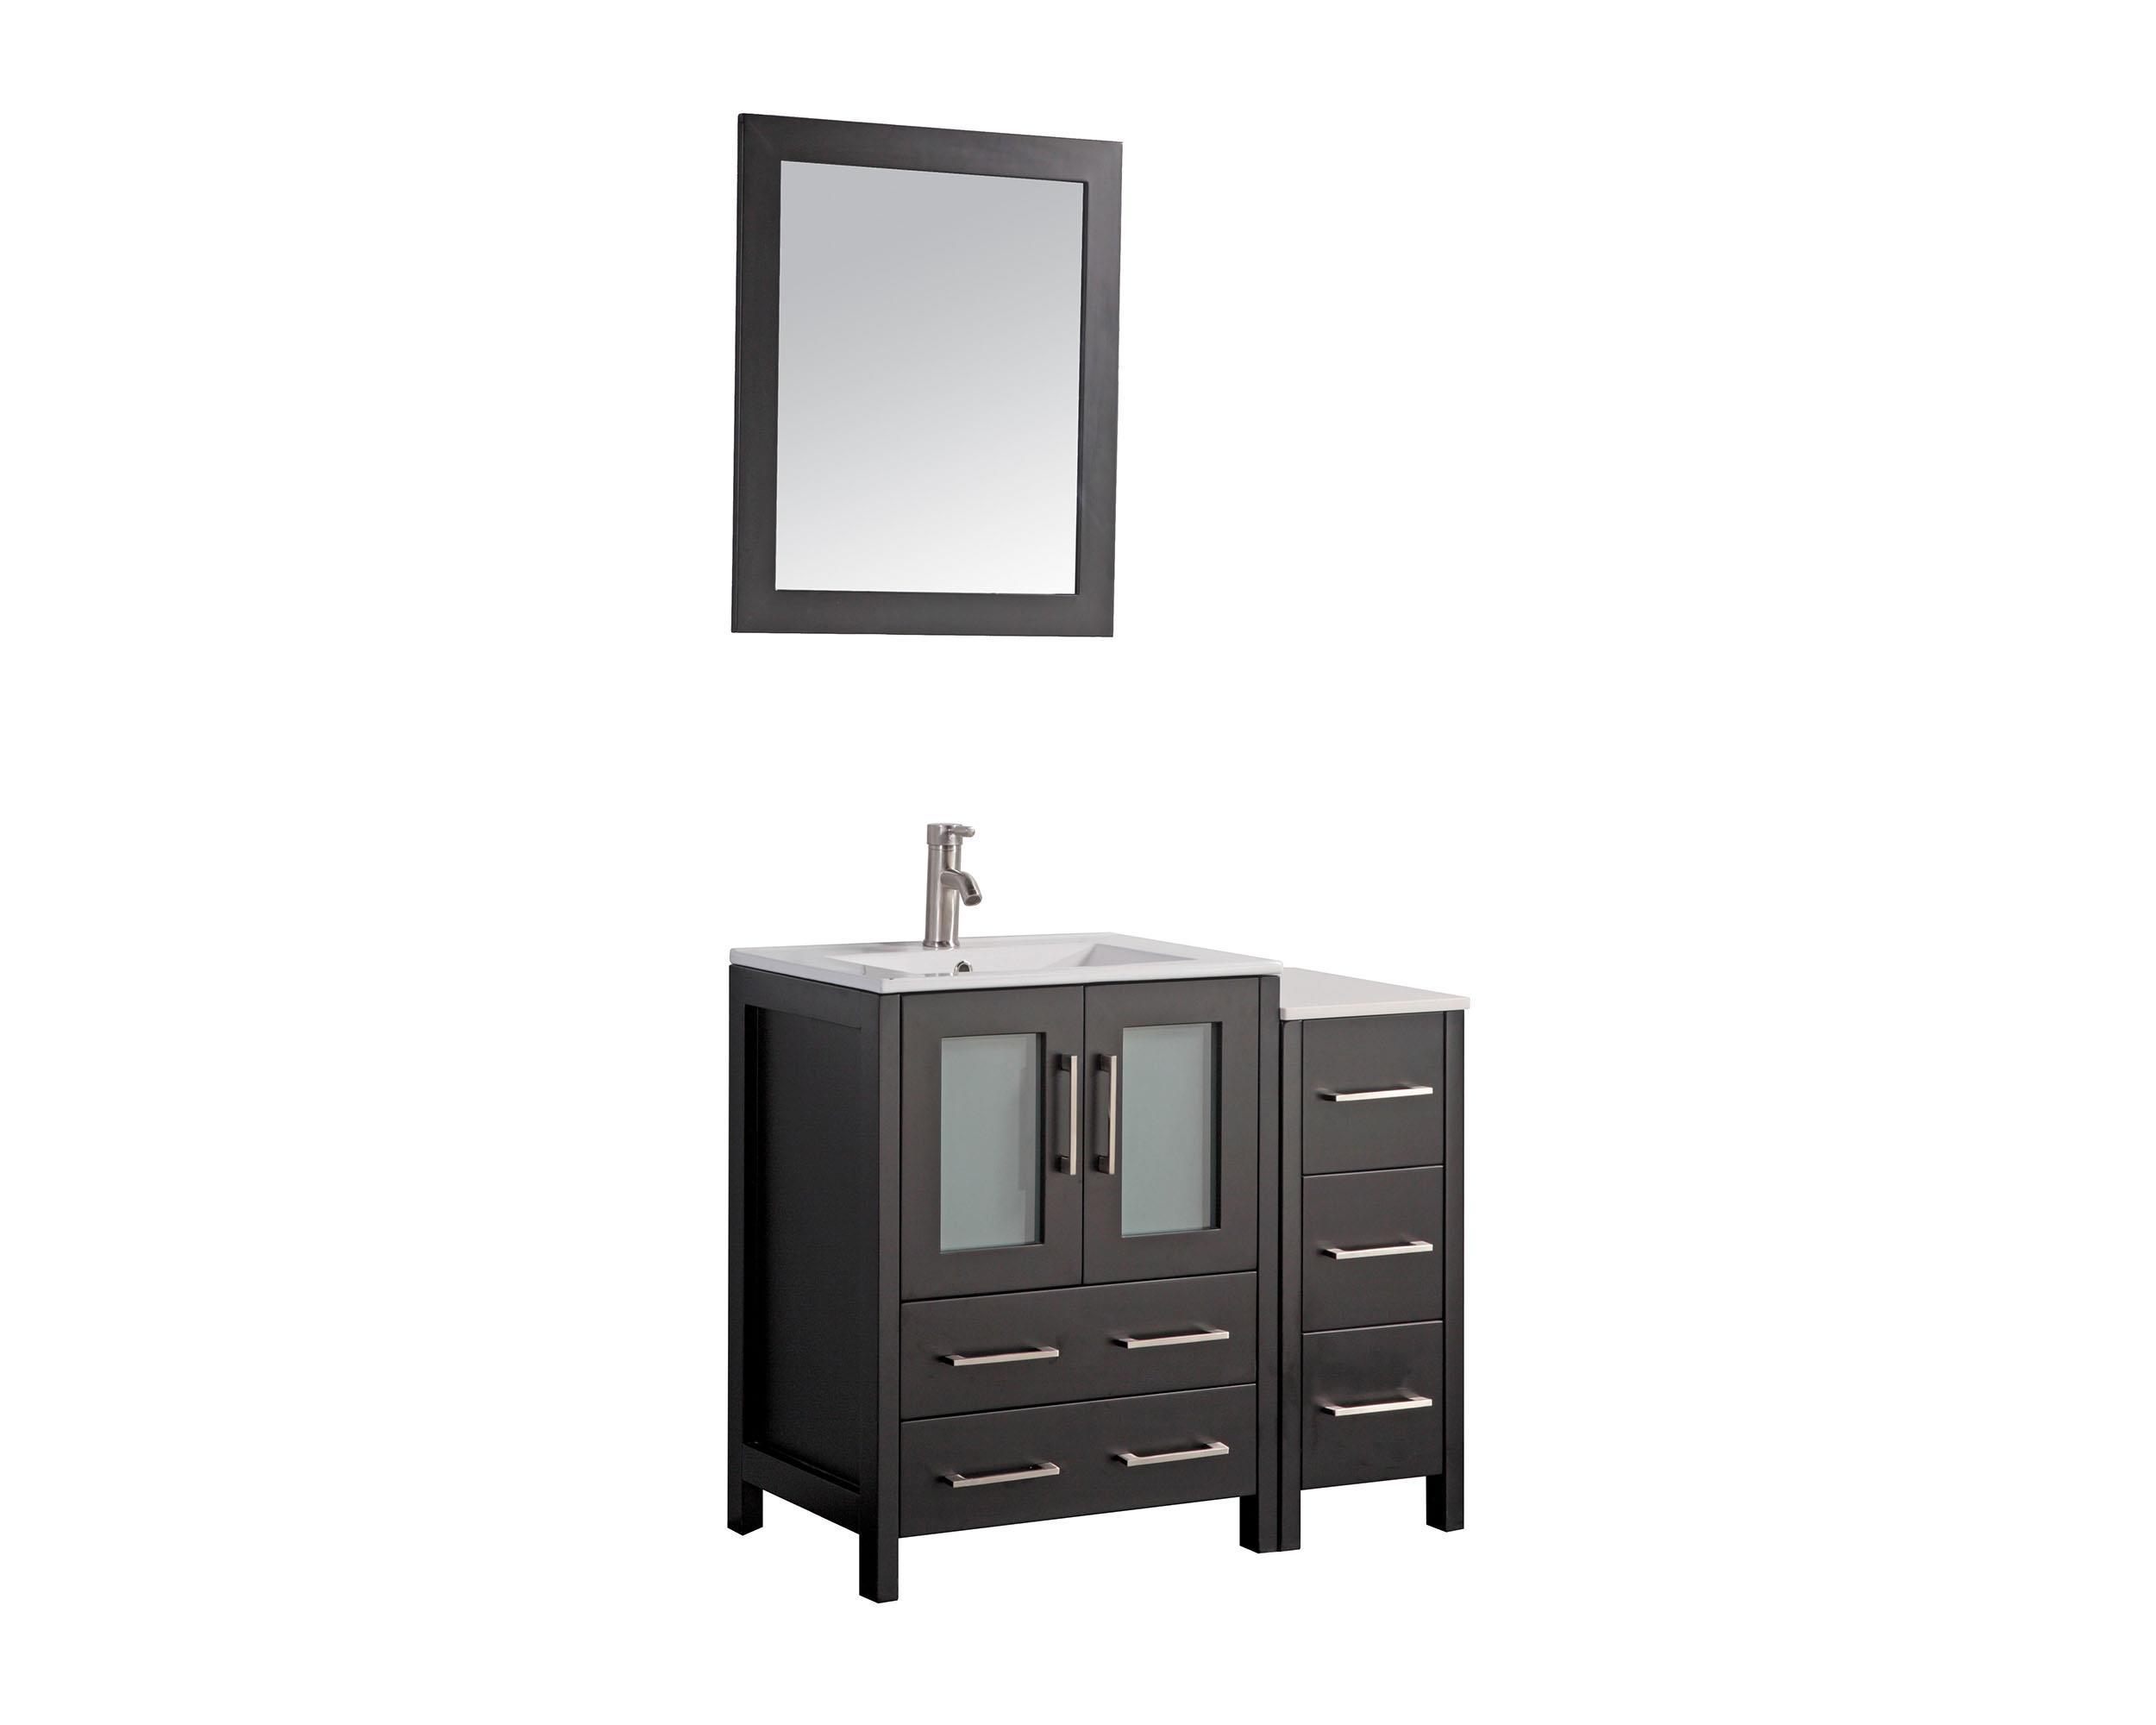 vanity art 36 inch single sink bathroom vanity set with ceramic vanity top walmart com